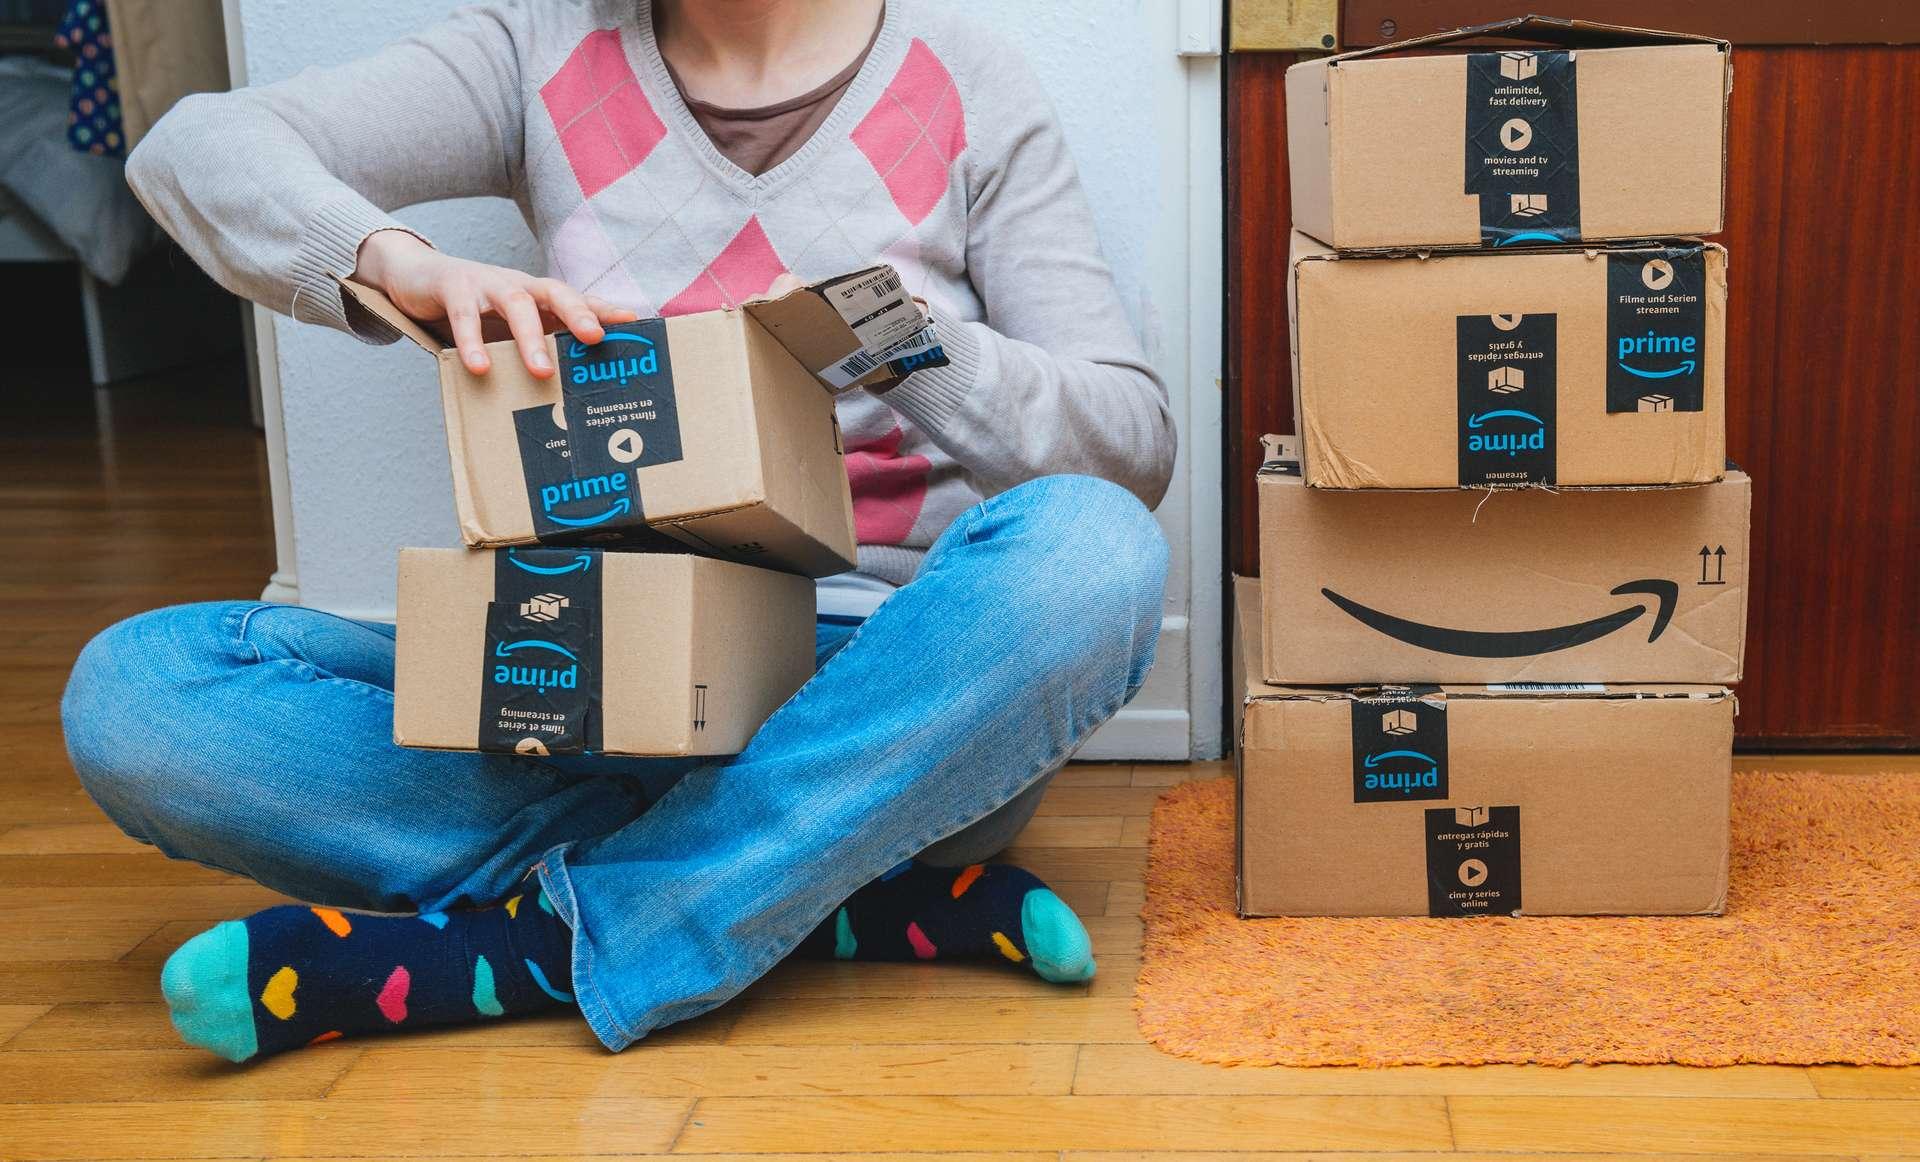 Profitez des ventes flash Amazon jusqu'au 7 Septembre © ifeelstock, Adobe Stock